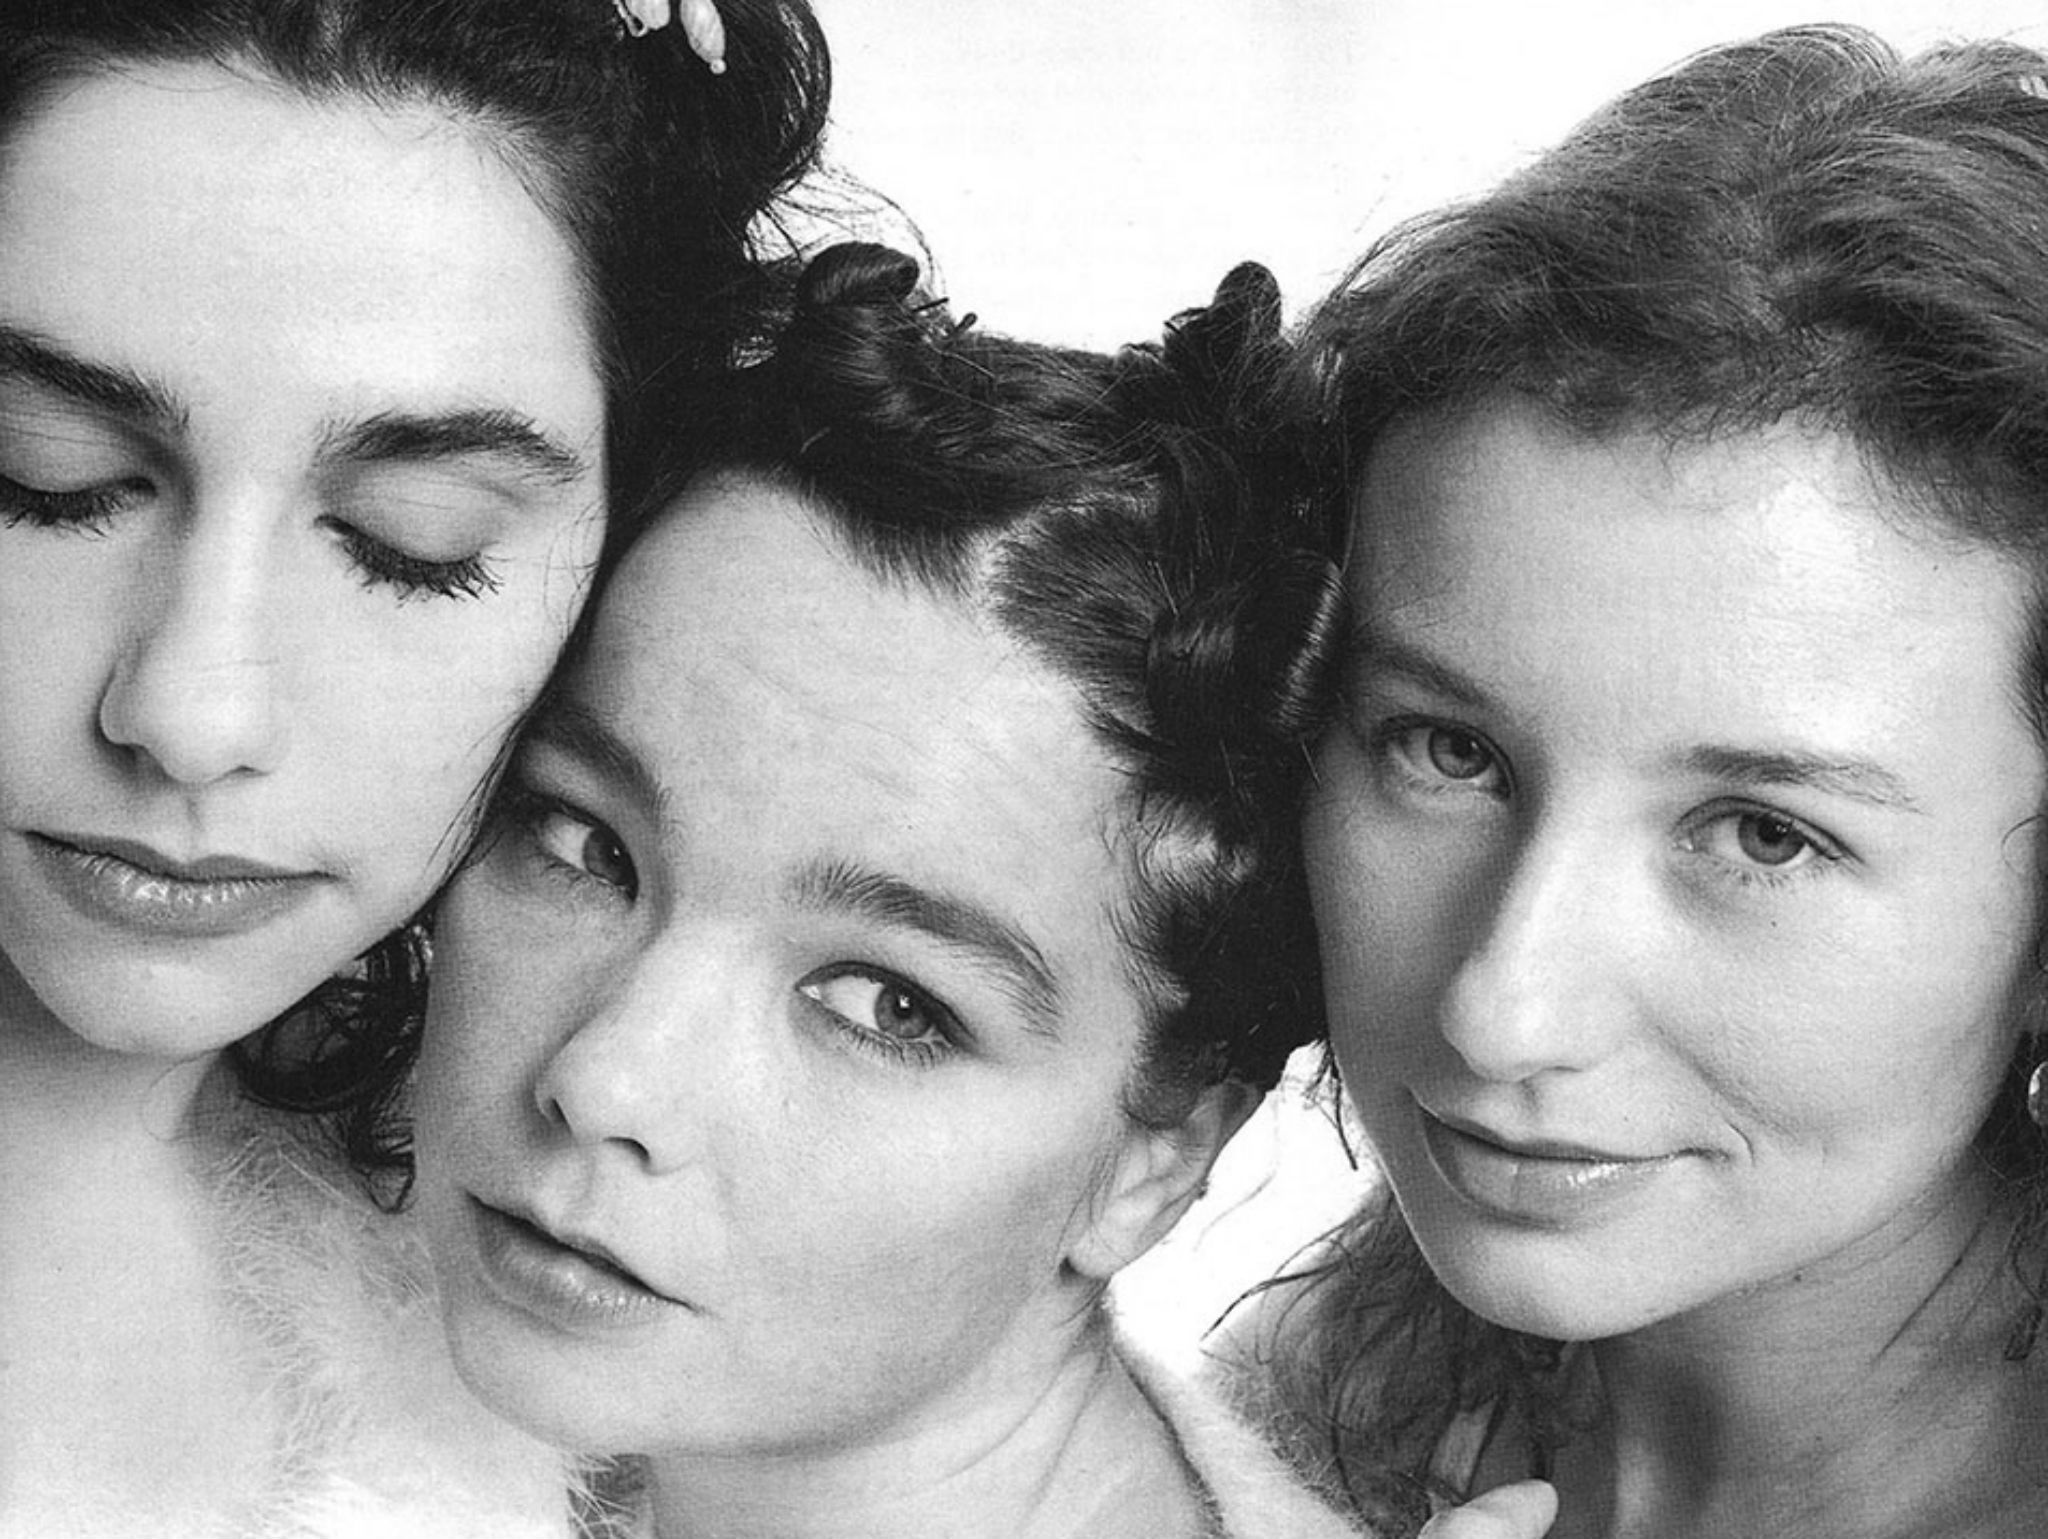 Pj Harvey, Björk y Tori Amos en sesión fotográfica